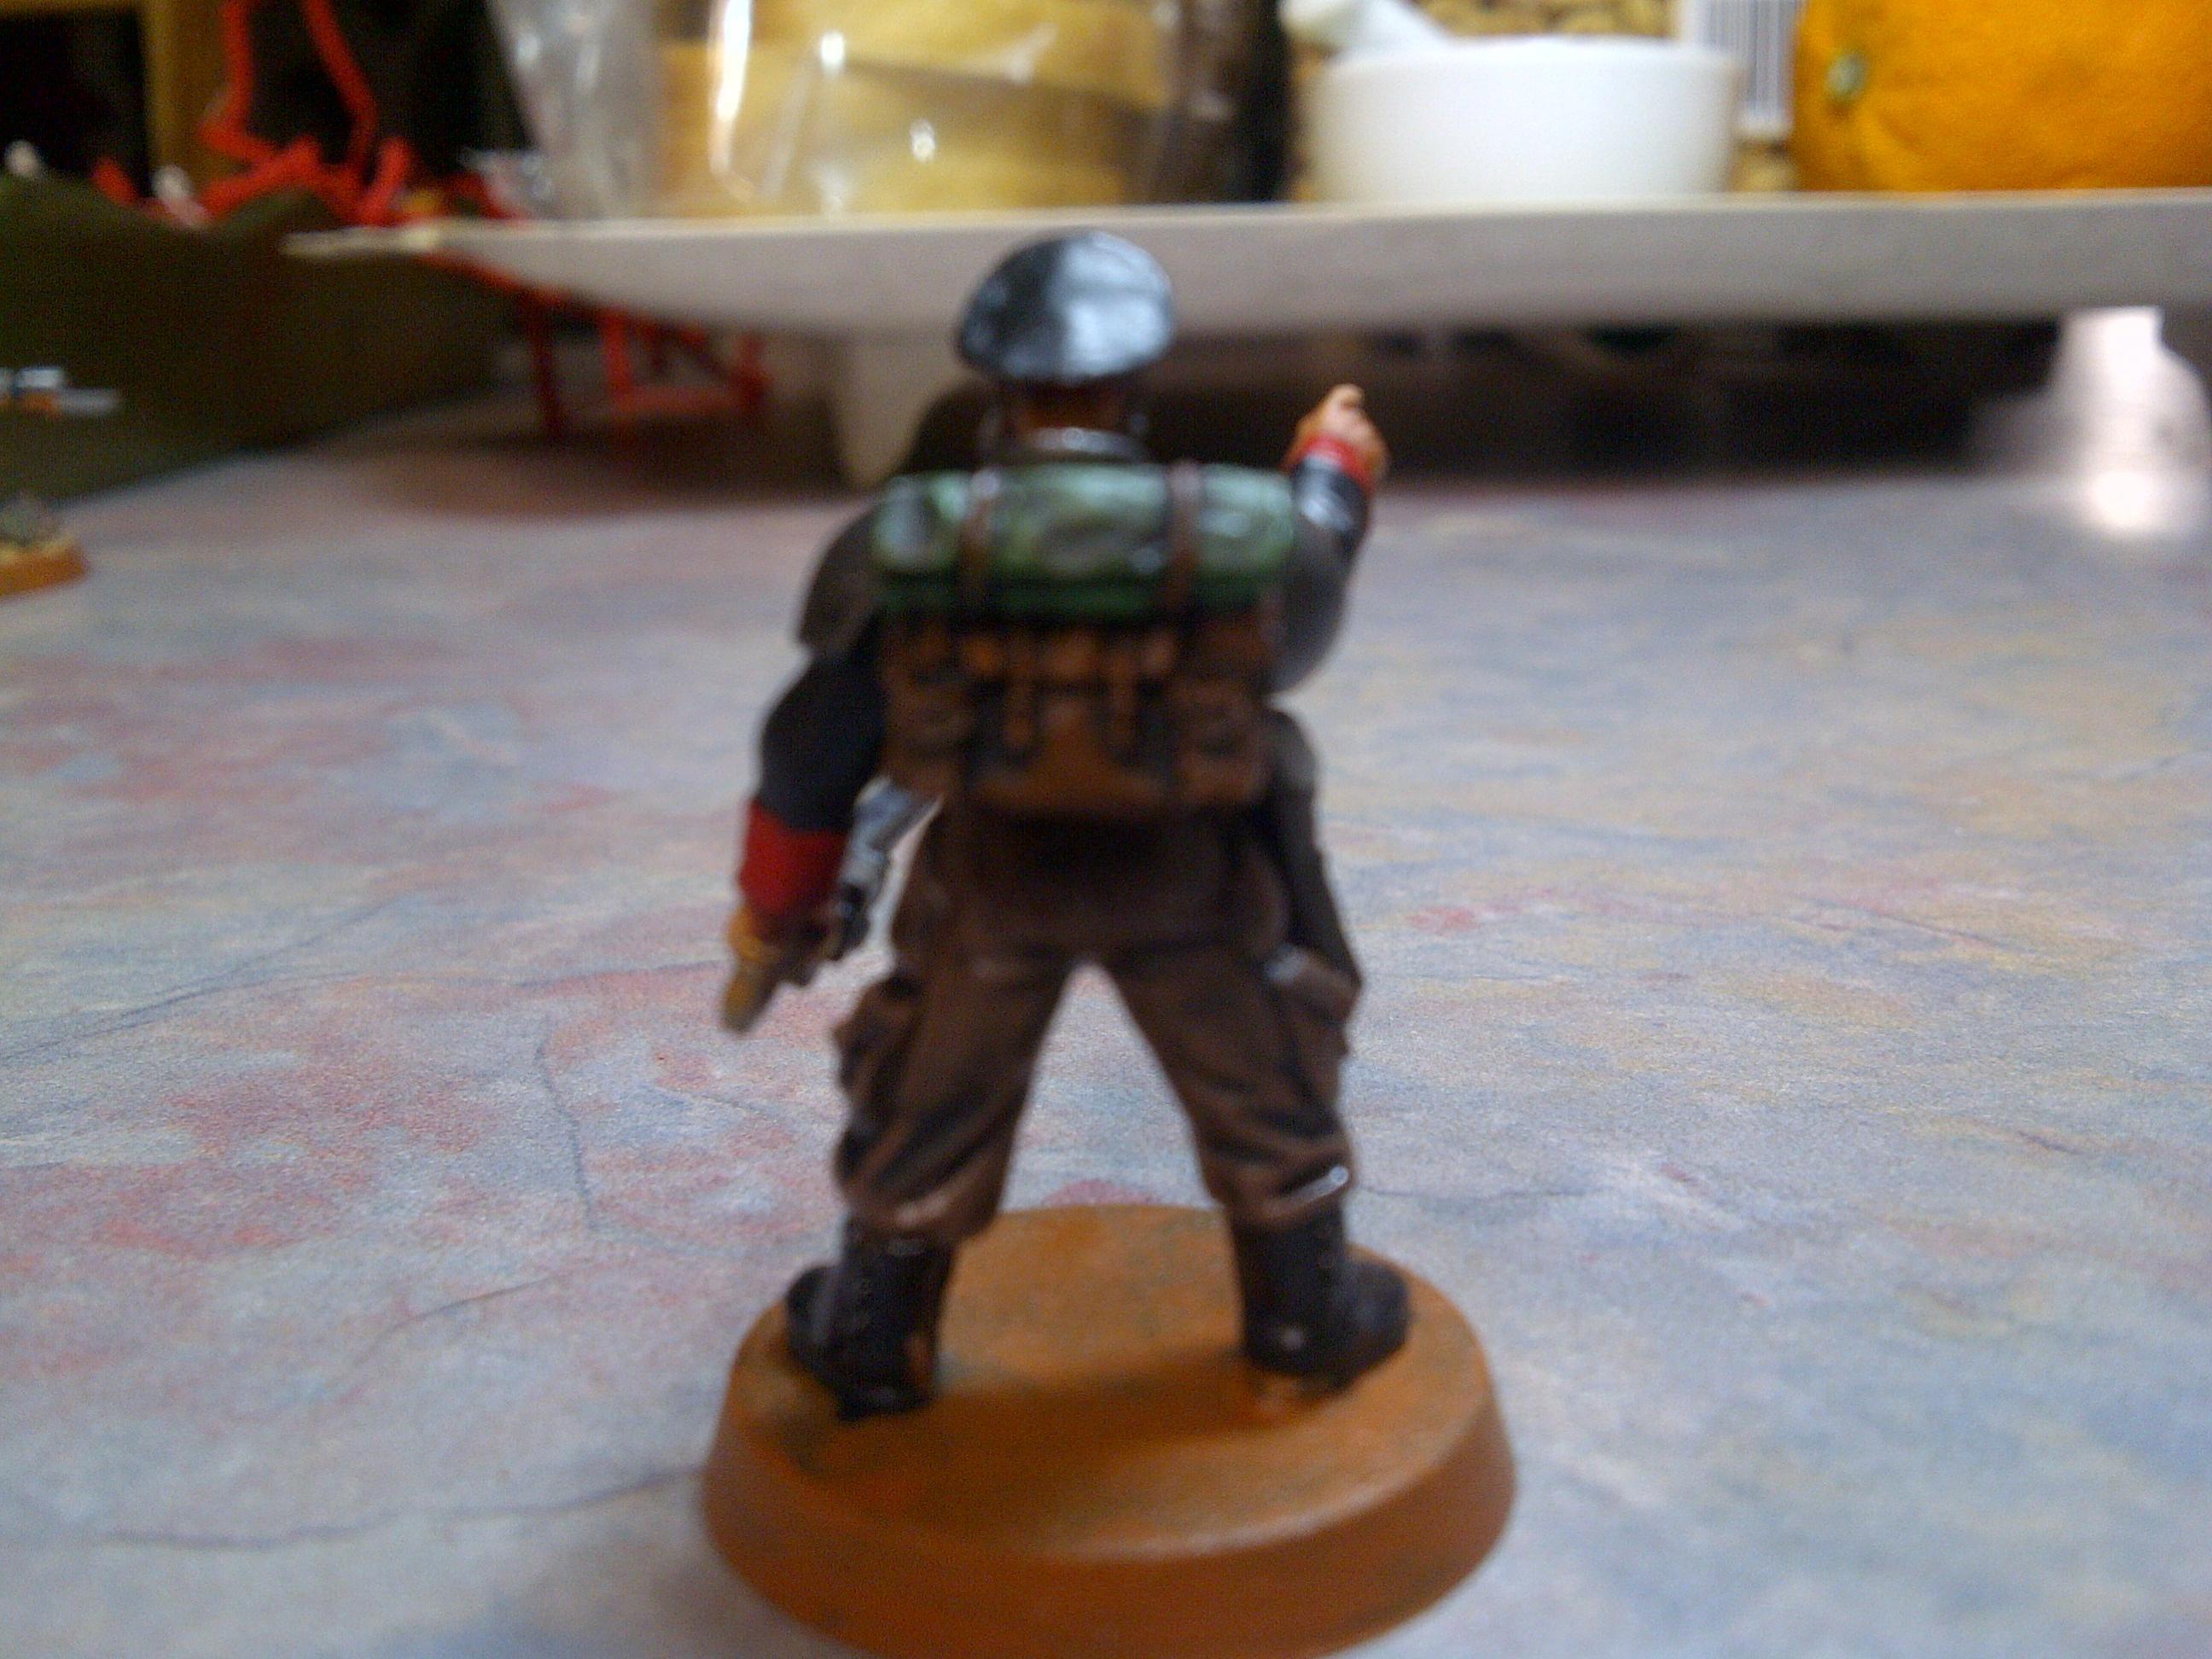 66th, Chem, Chem-dogs, Command, Corr, Dogs, Guard, Imperial, Imperial Guard, Pcs, Platoon, Savlar, Serevin, Squad, Xxweaponprimexx